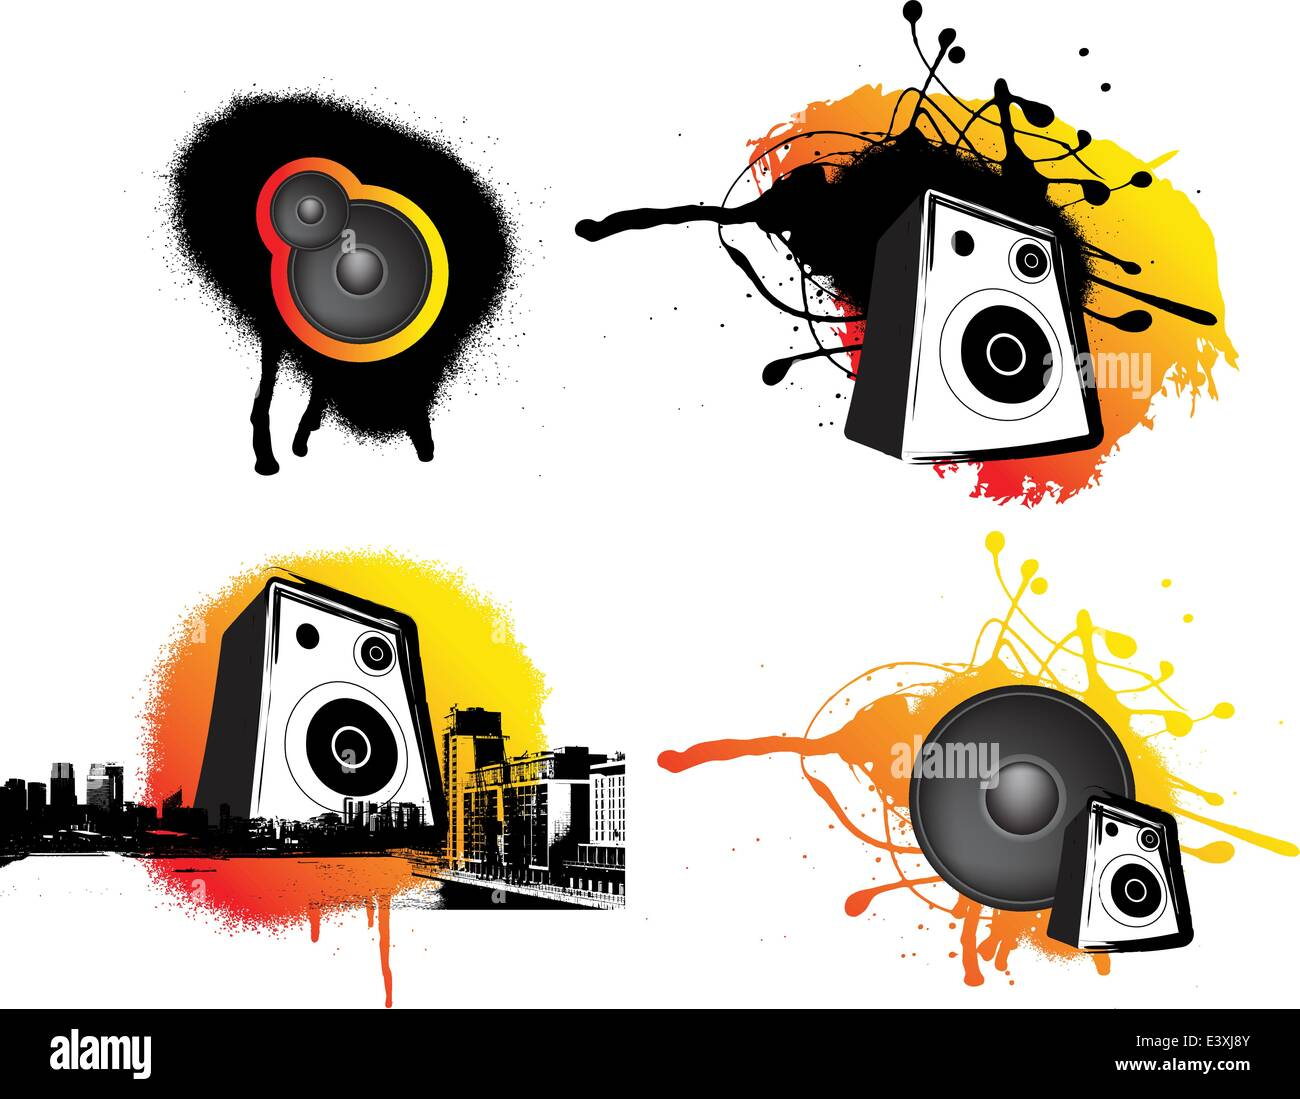 black and ornage urban music set of 4 graphics - Stock Image